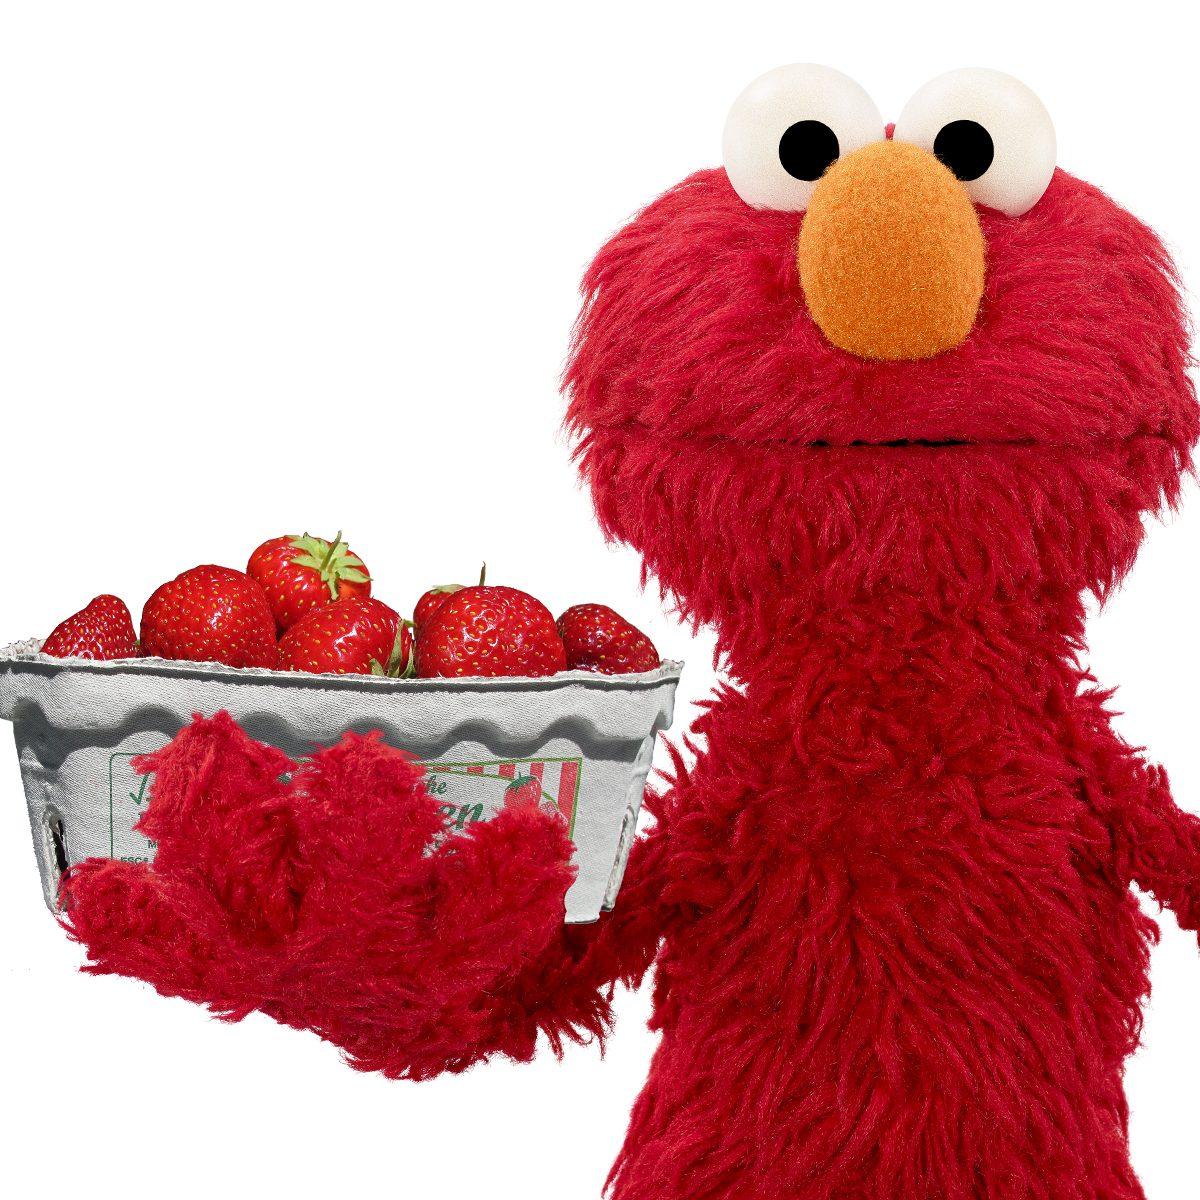 Elmo Strawberry Pops